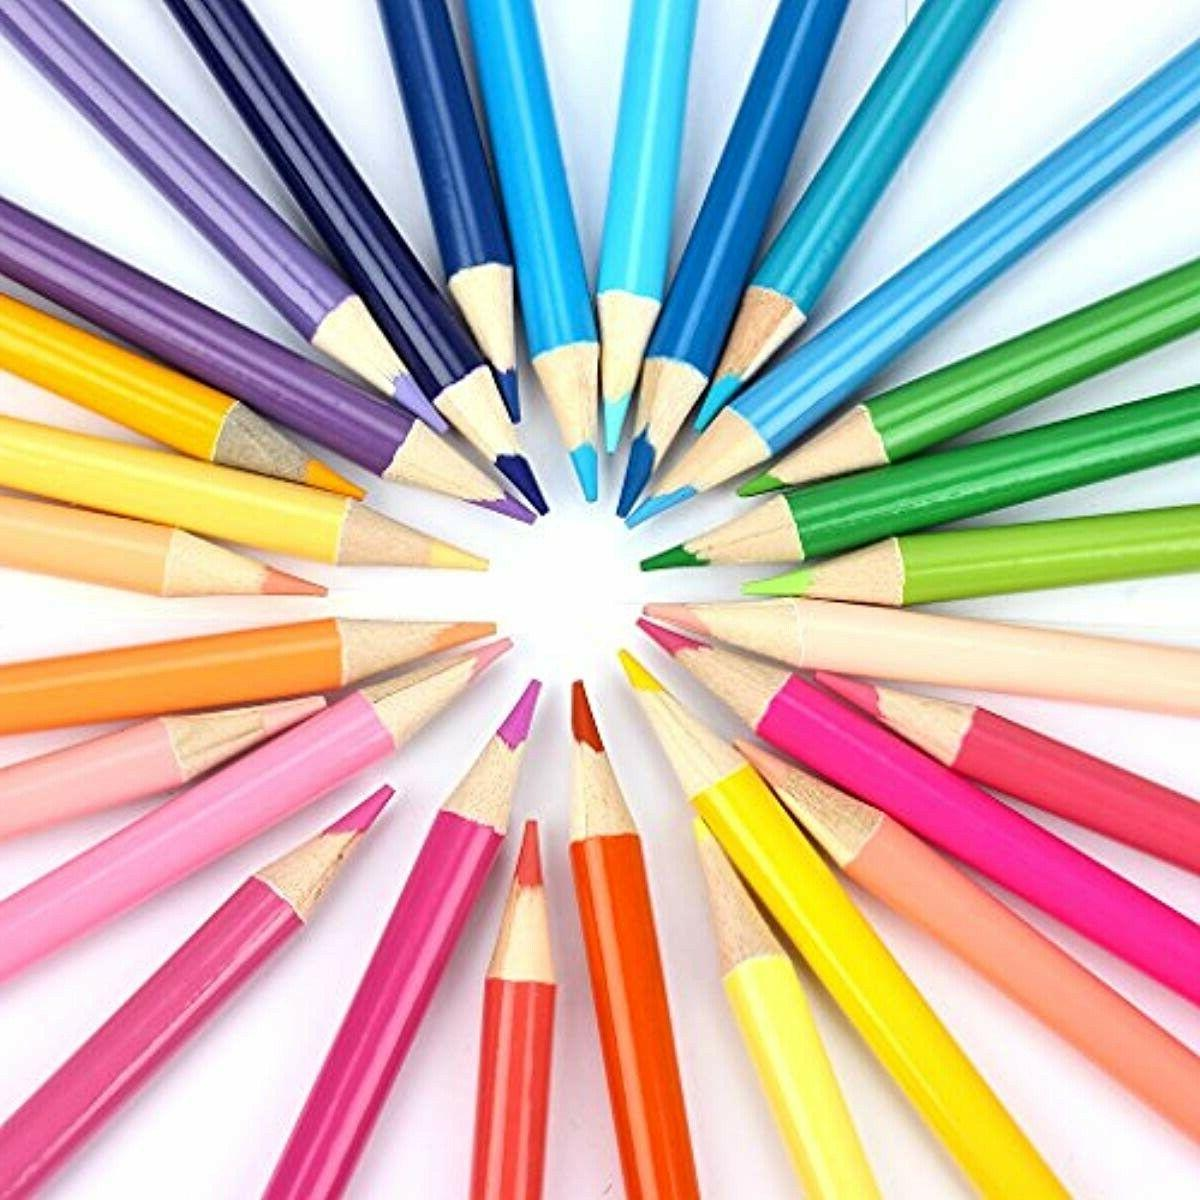 Soucolor Colored Pencils cracking